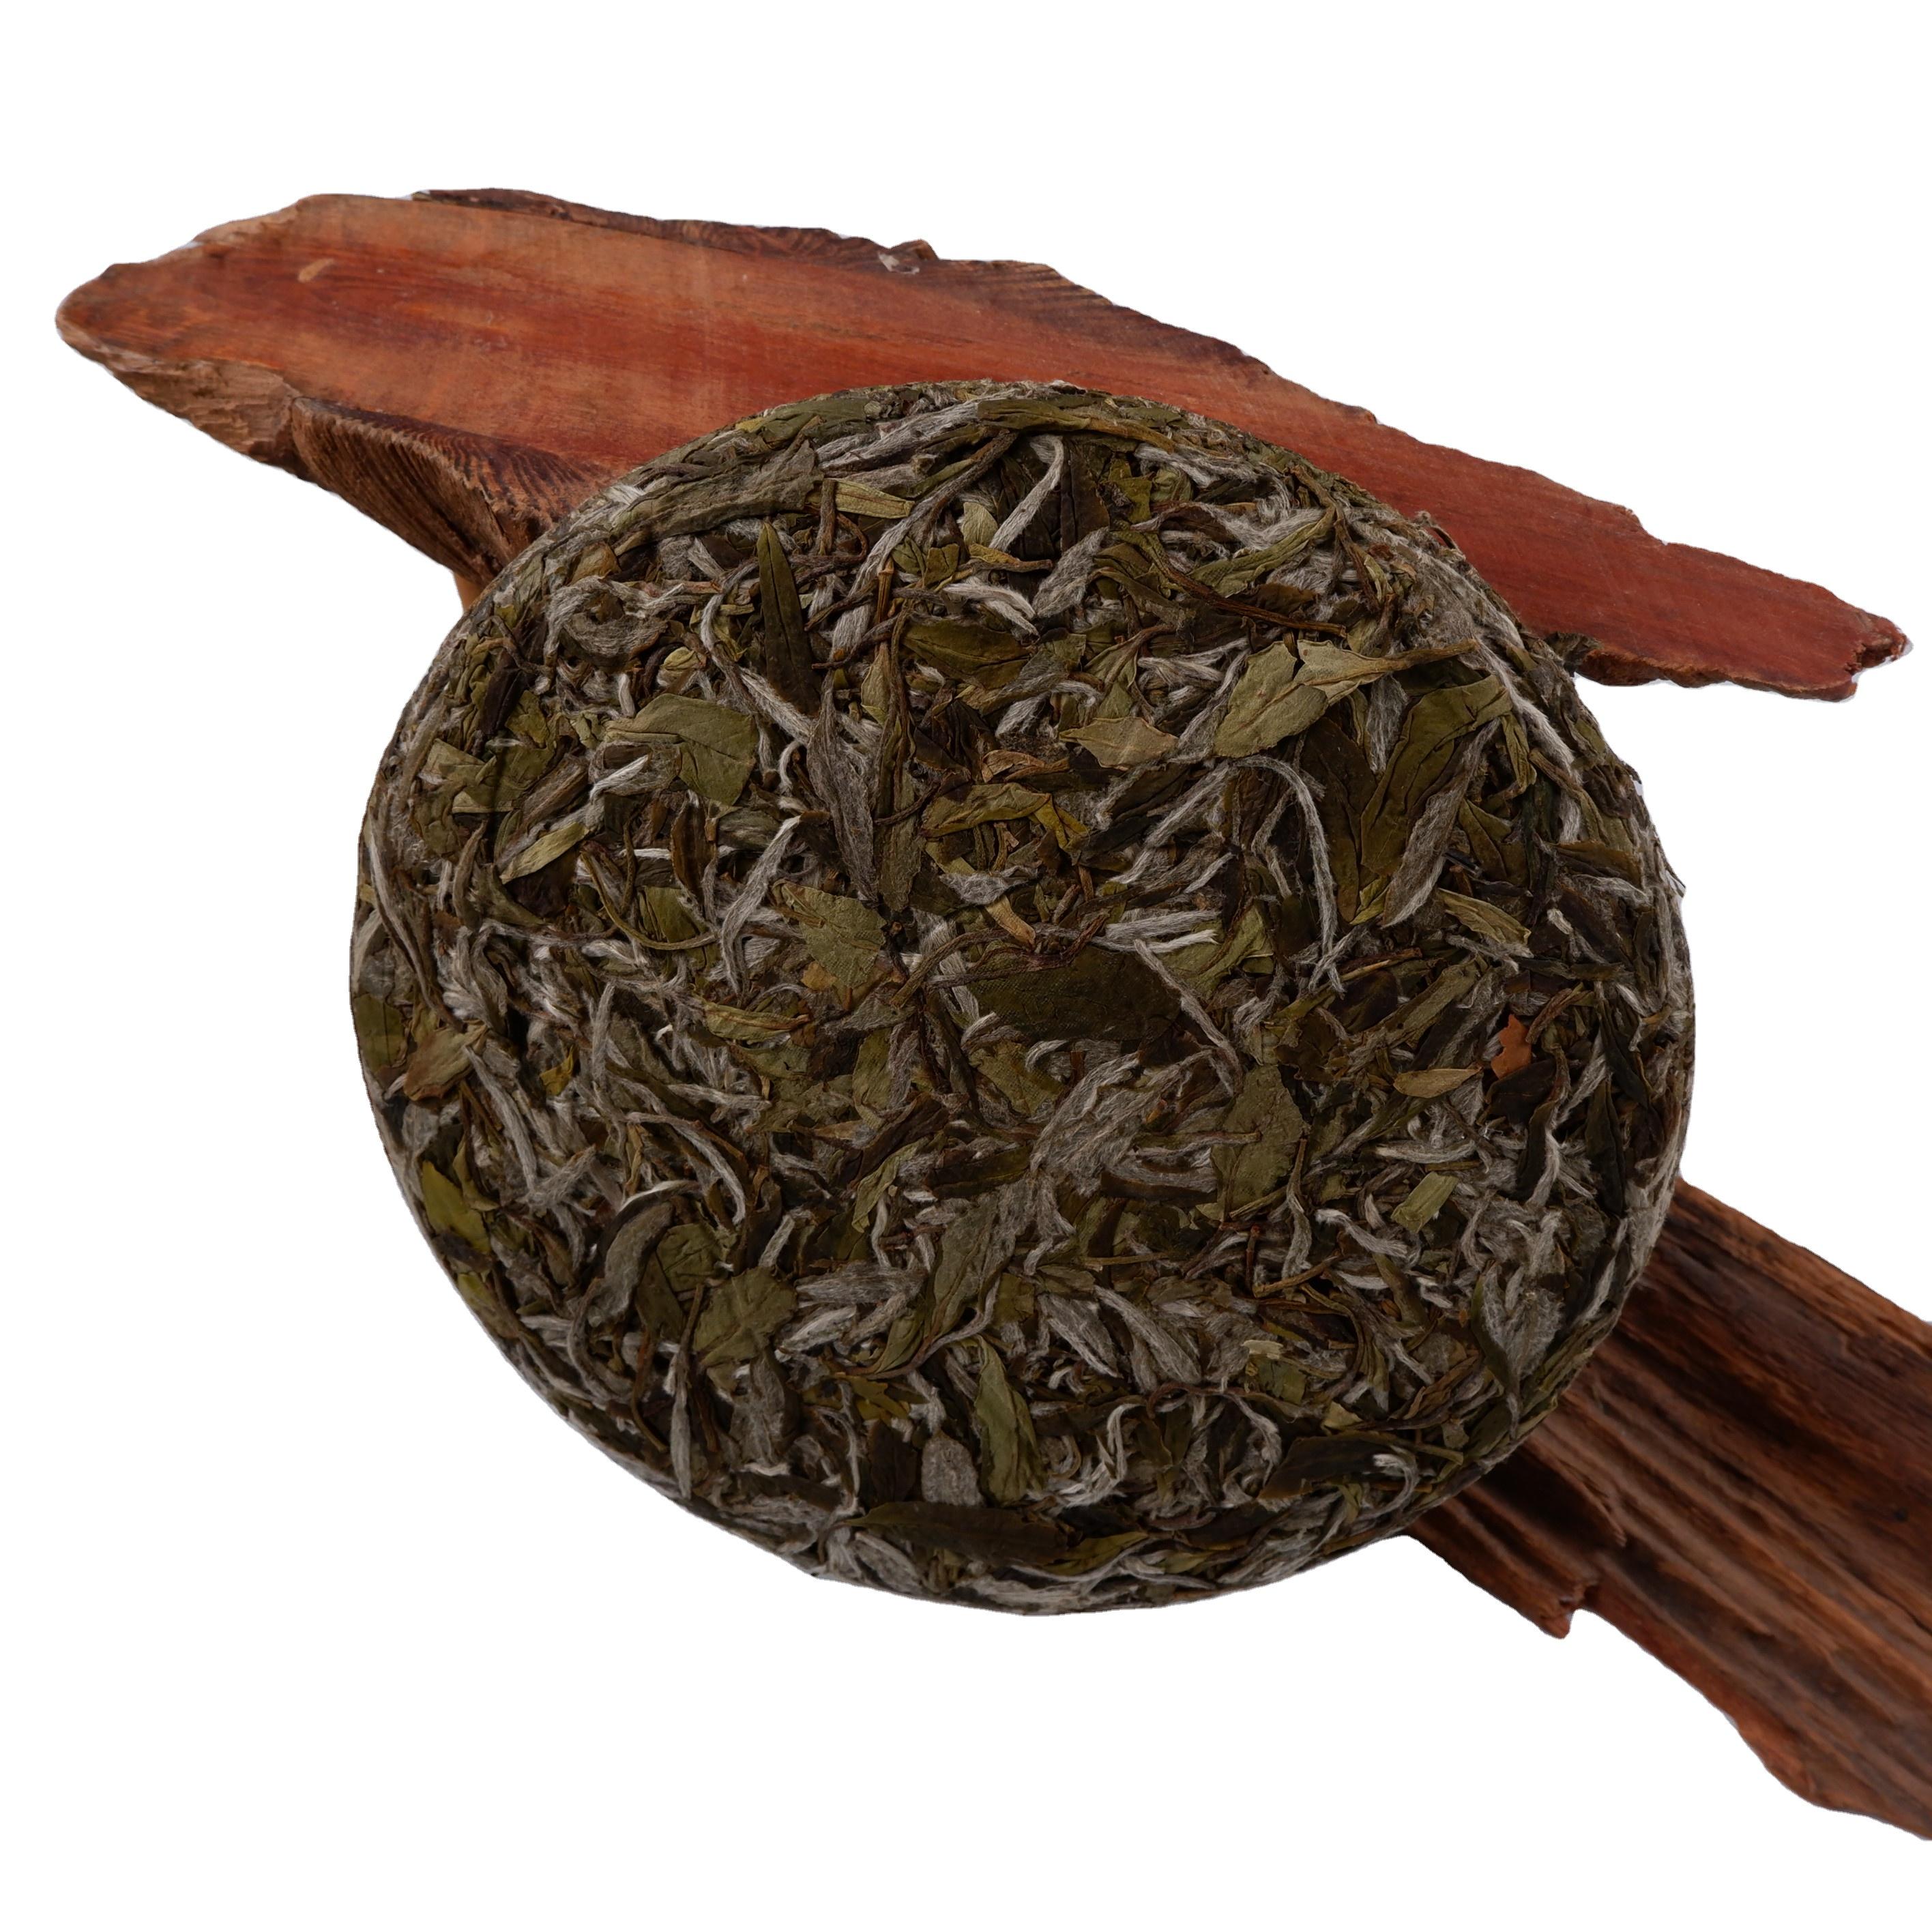 Chinese High Quality Traditional Handmade Healthy Compressed Bai Mu Dan White Tea Cake - 4uTea | 4uTea.com